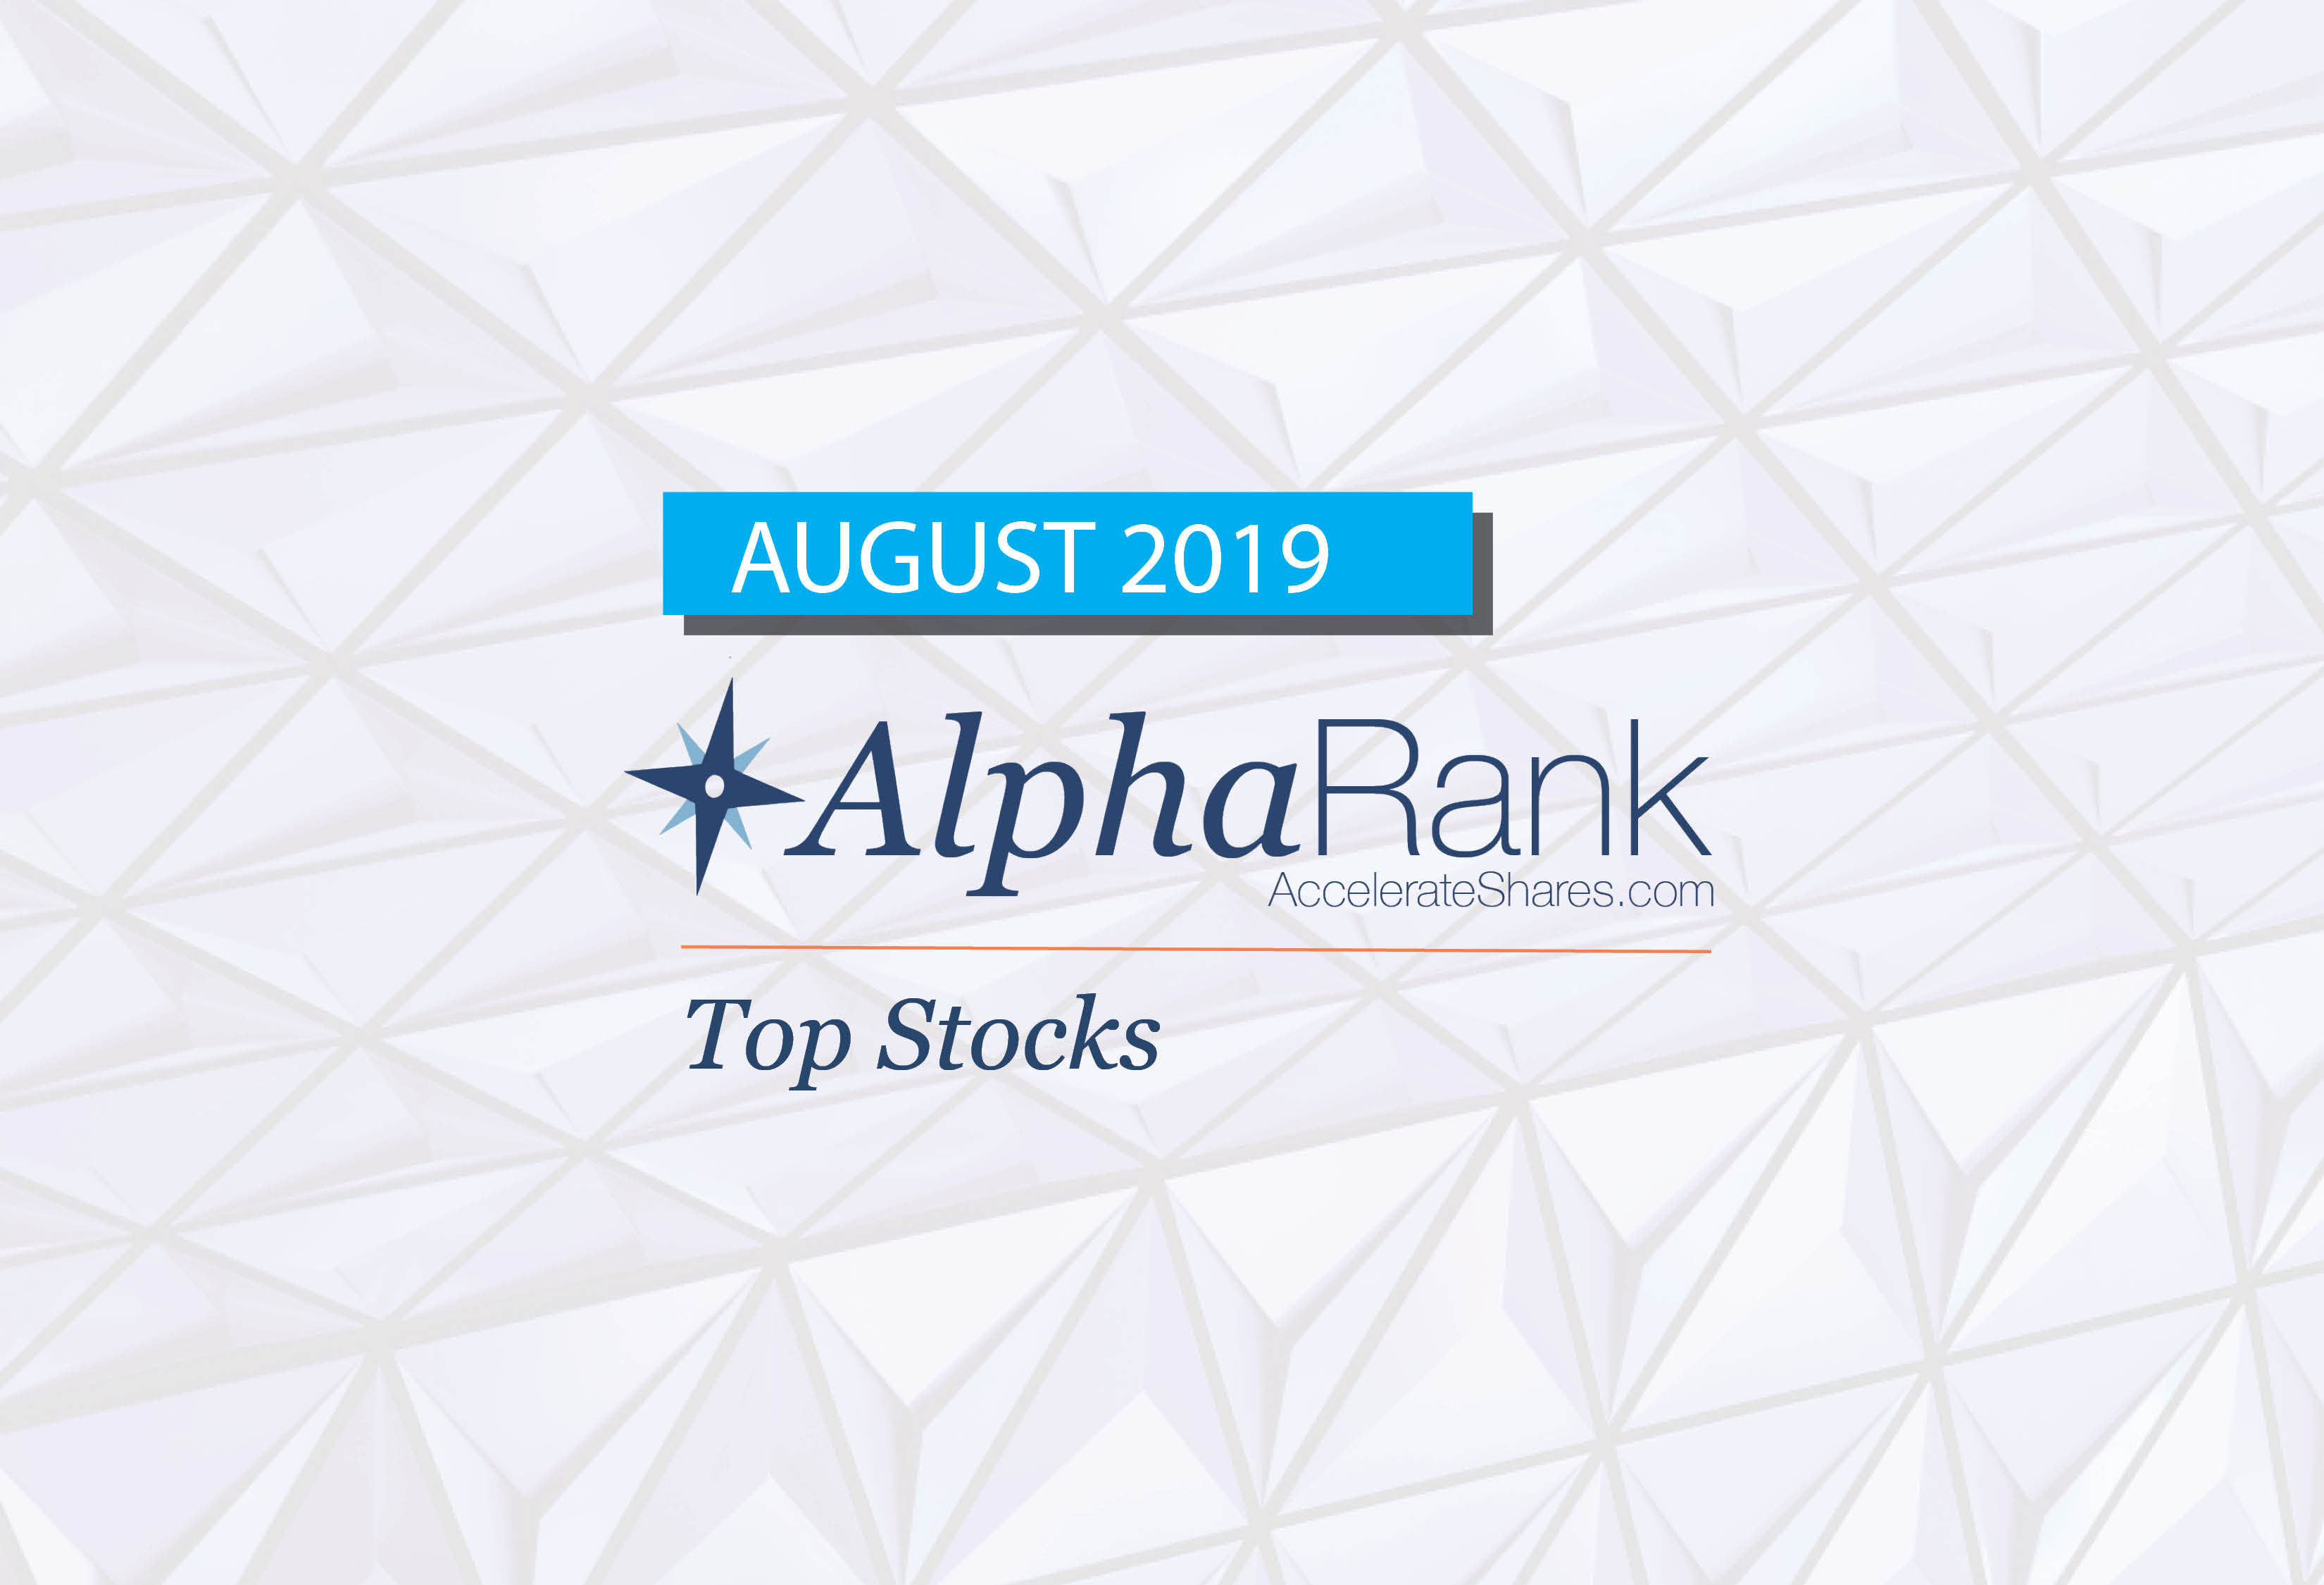 AlphaRank Top Stocks– August 2019